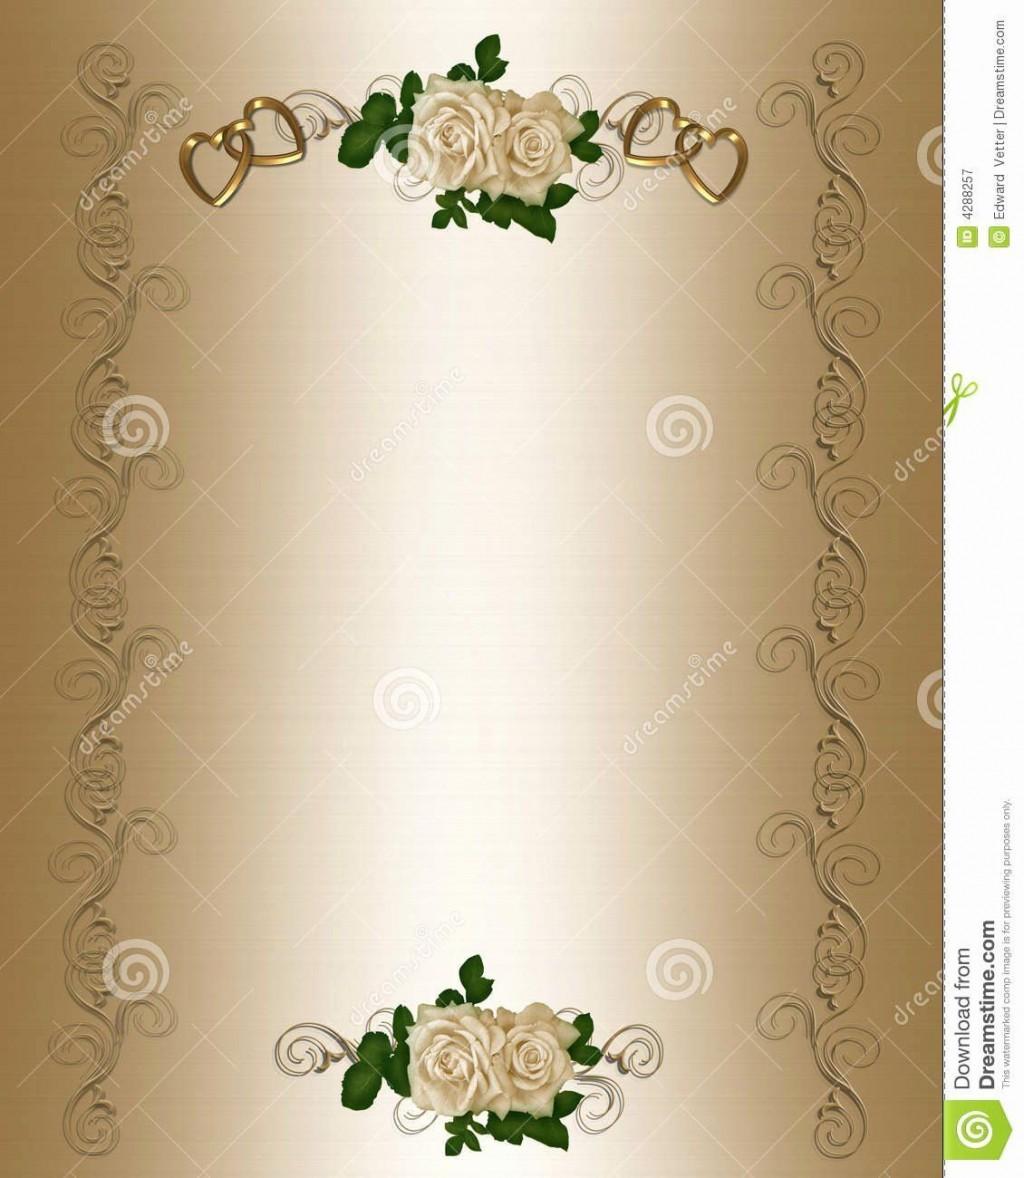 008 Phenomenal 50th Anniversary Invitation Template Free Download High Resolution  Golden WeddingLarge